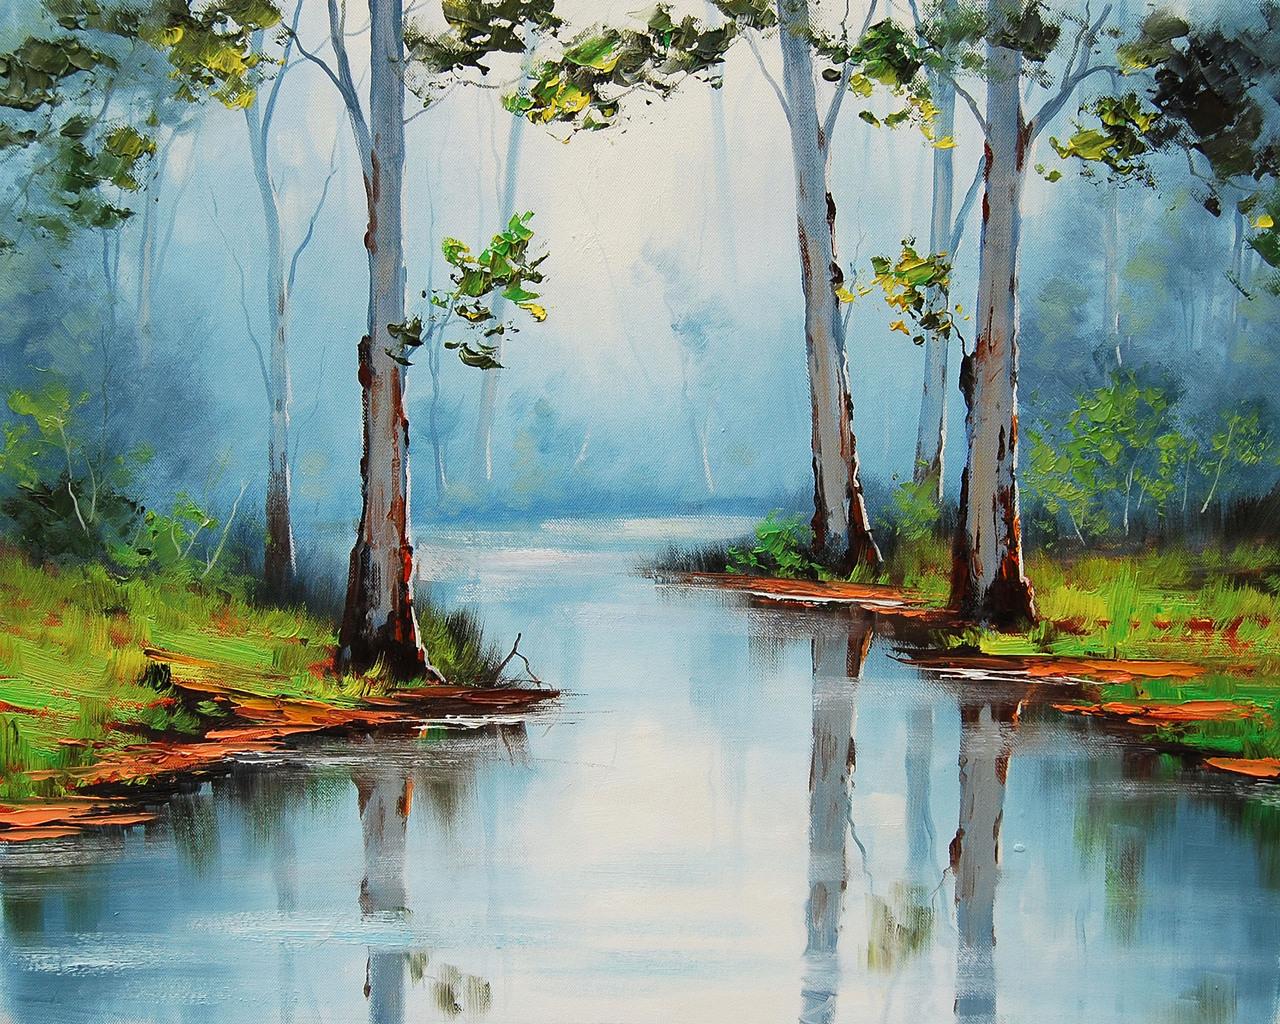 Река рисунок 1280 x 1024